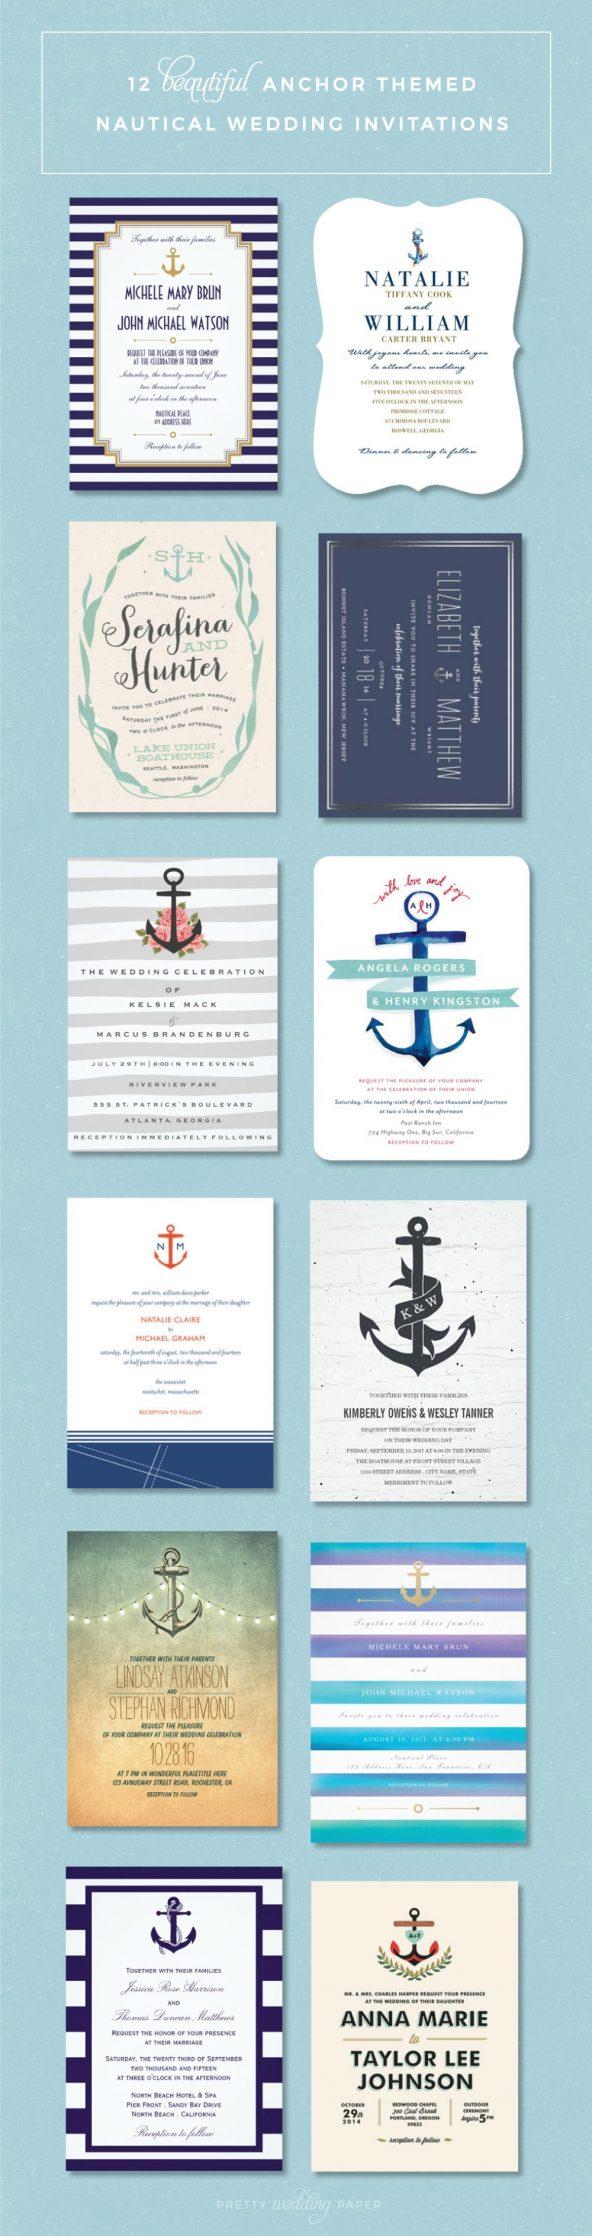 Nautical Wedding Invitations Bridal Shower